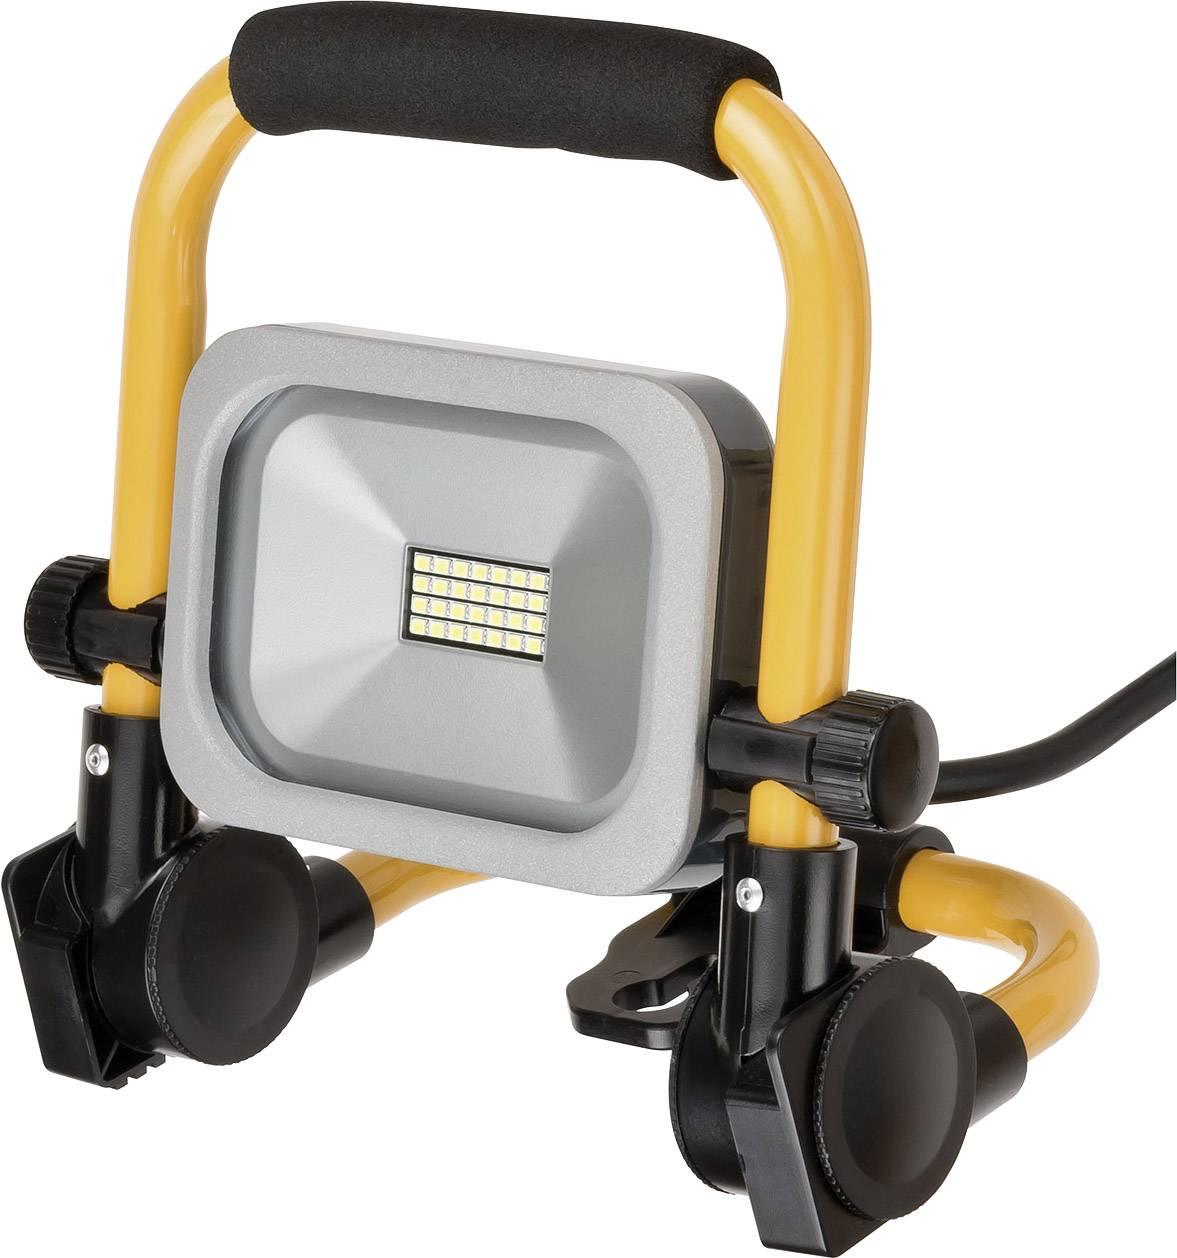 BrennenstuhlBouwplaatsen verlichting 1172900102 Zwart-geel LED vast ...